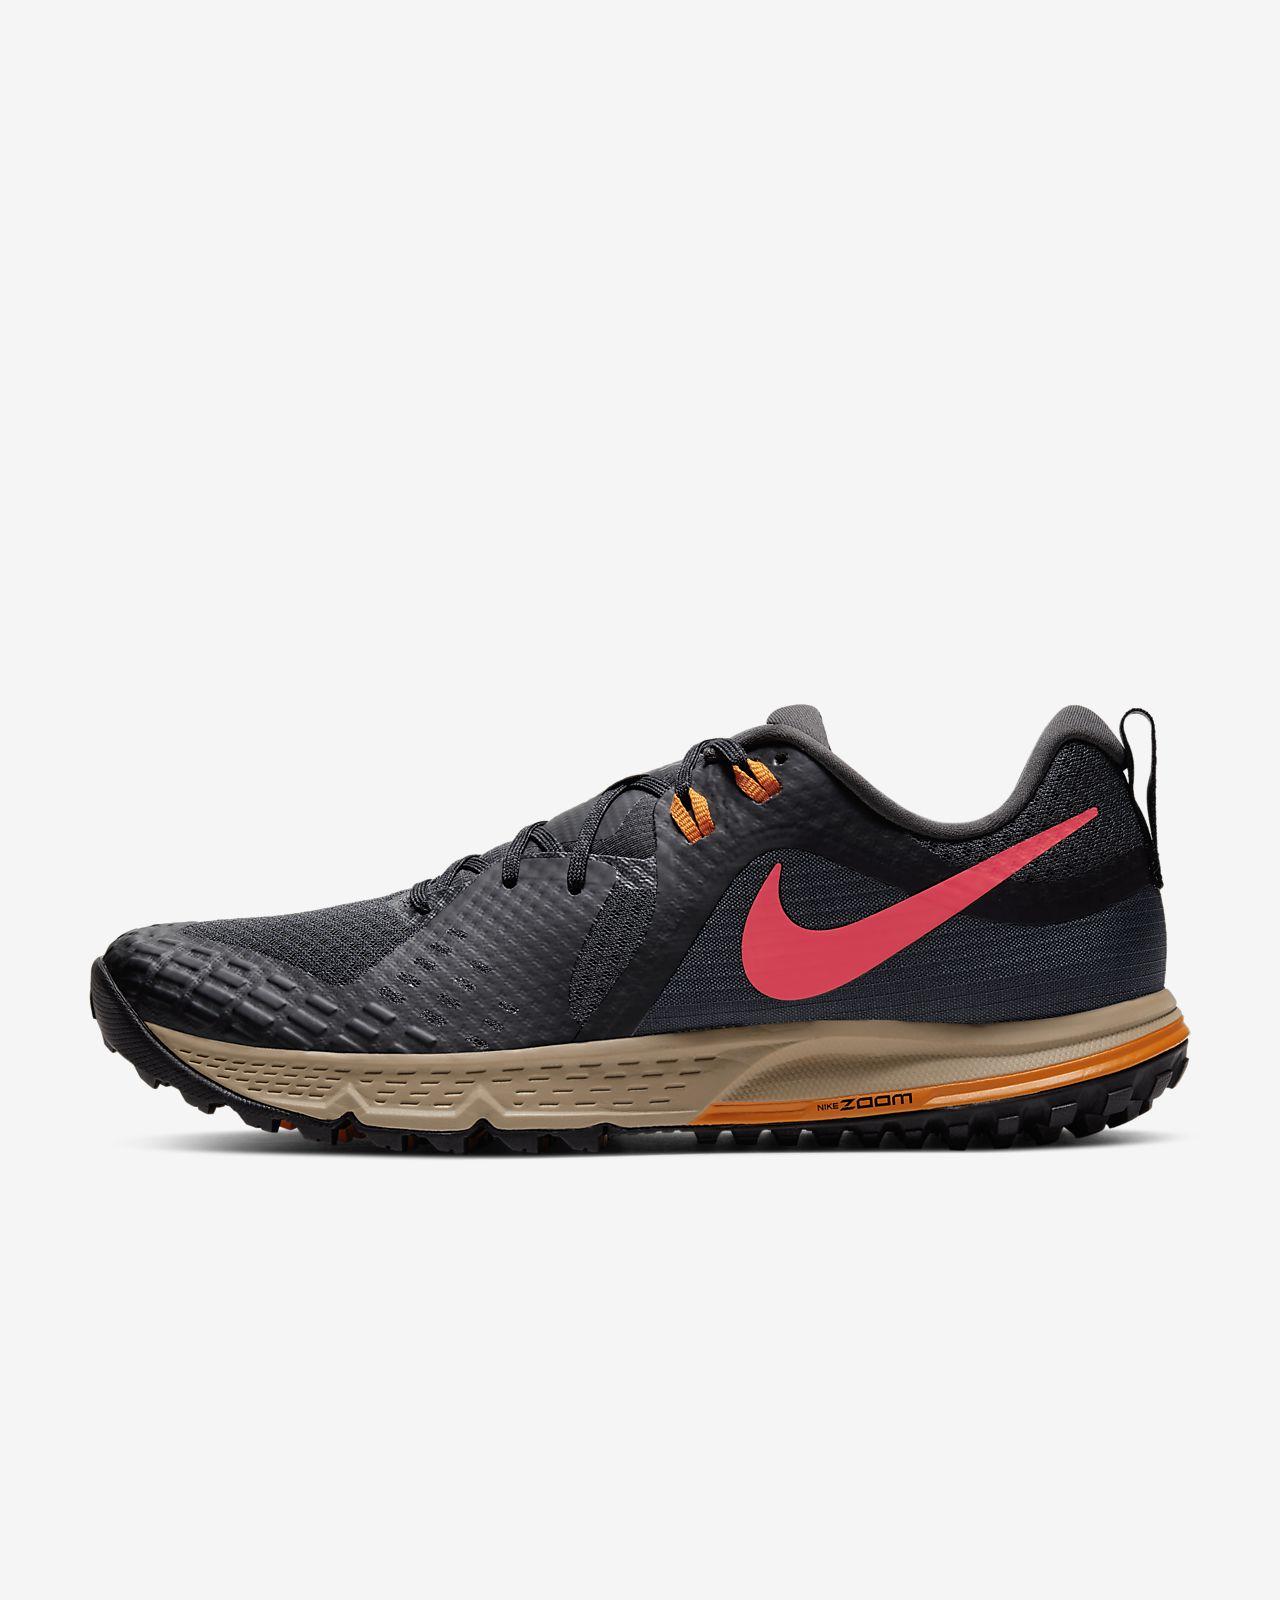 Nike Air Zoom Wildhorse 5 Sabatilles de trail running - Home